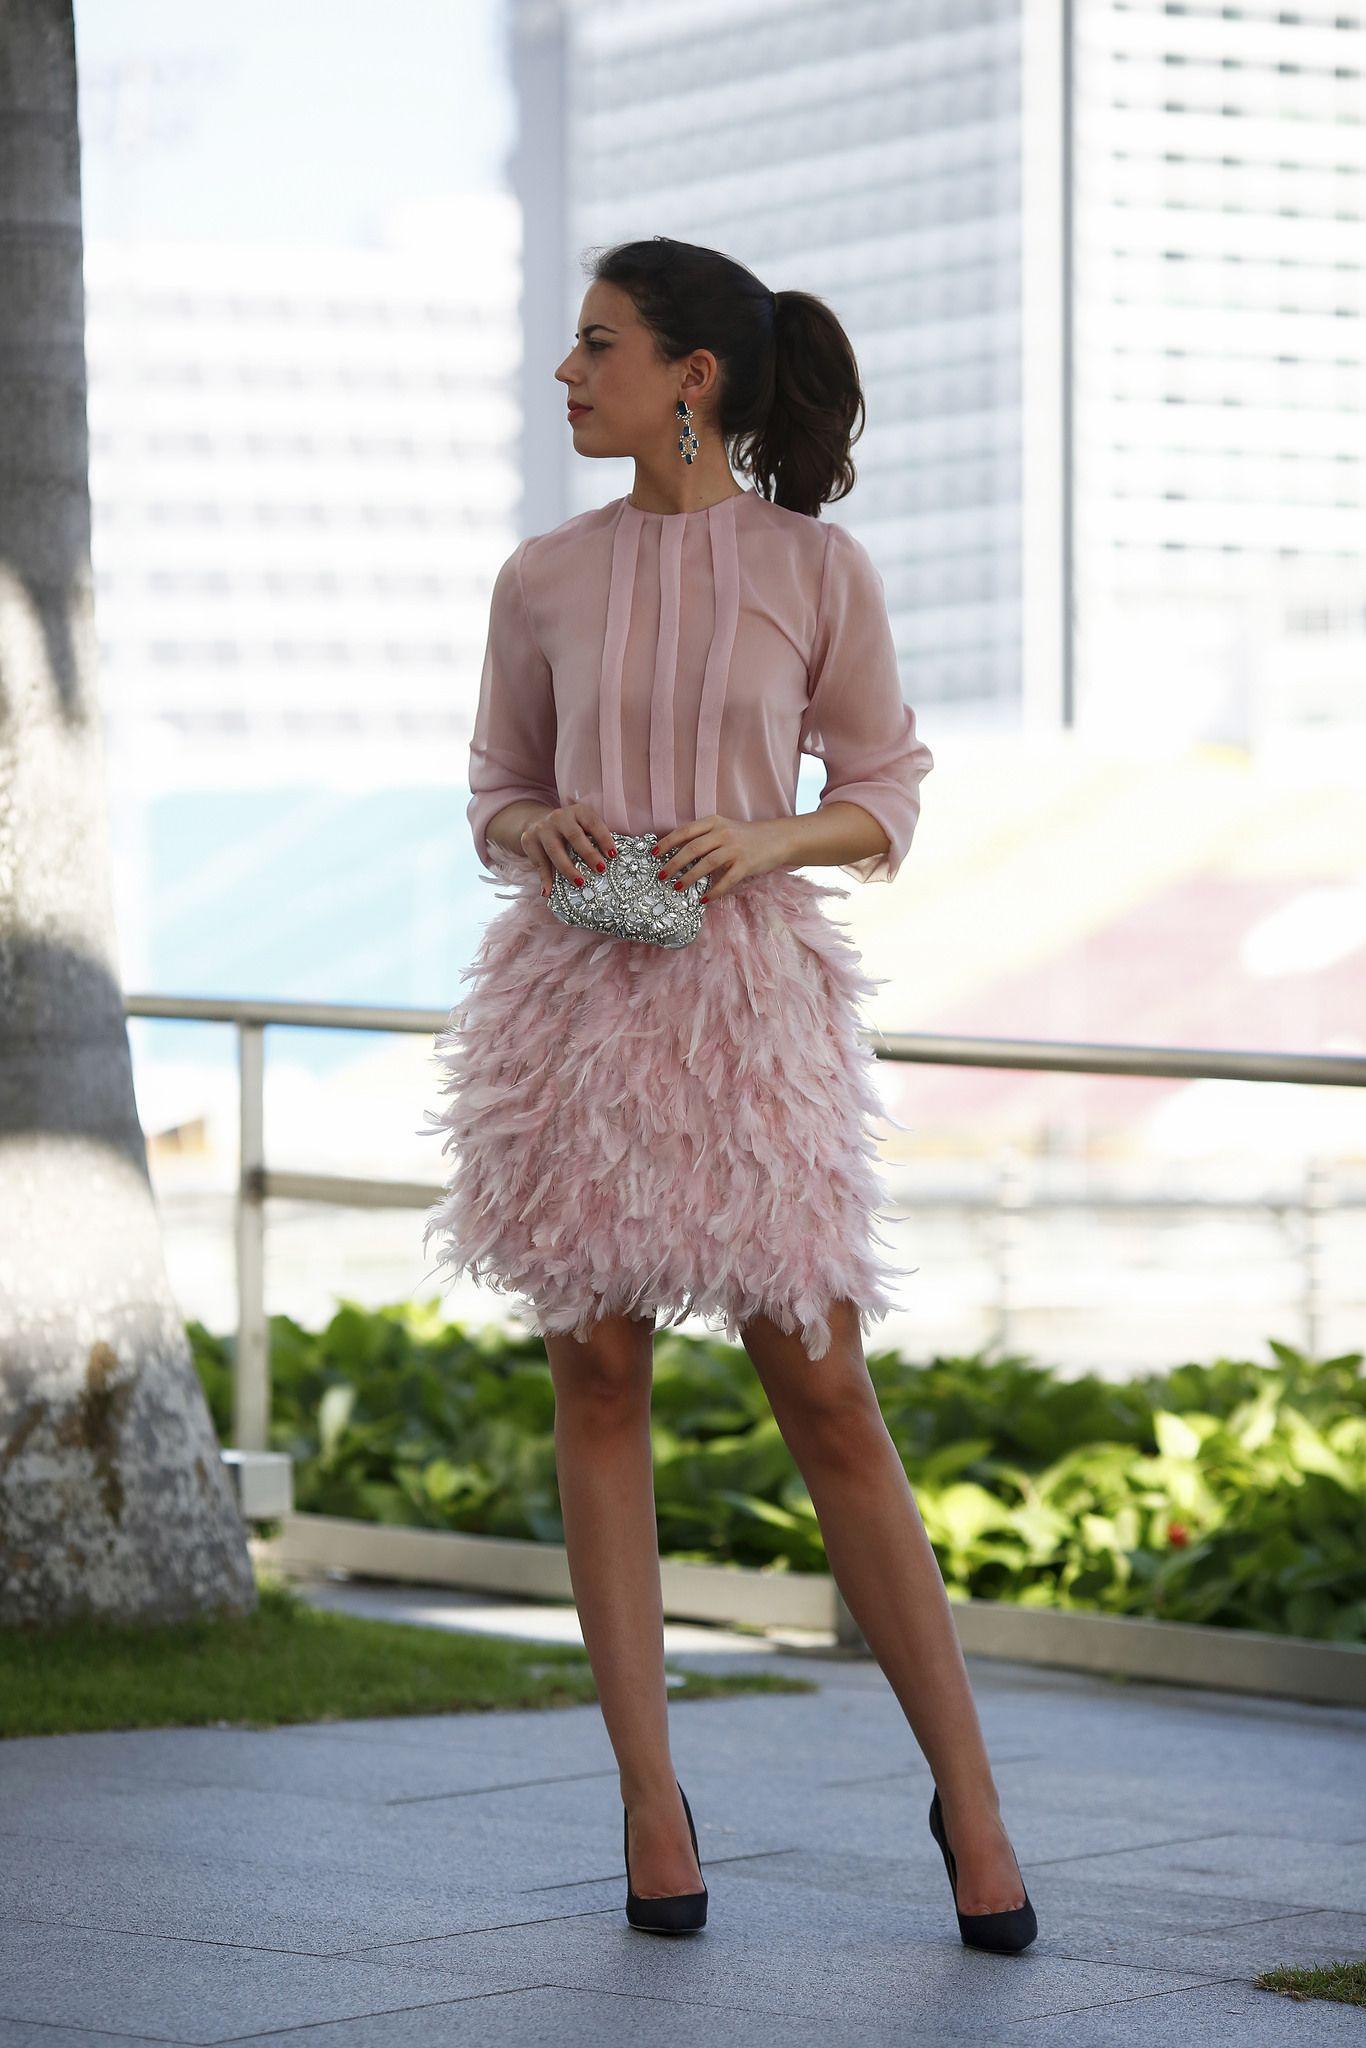 fashion #fashionista _96B3702 | Vestidos | Pinterest | Fundstücke ...